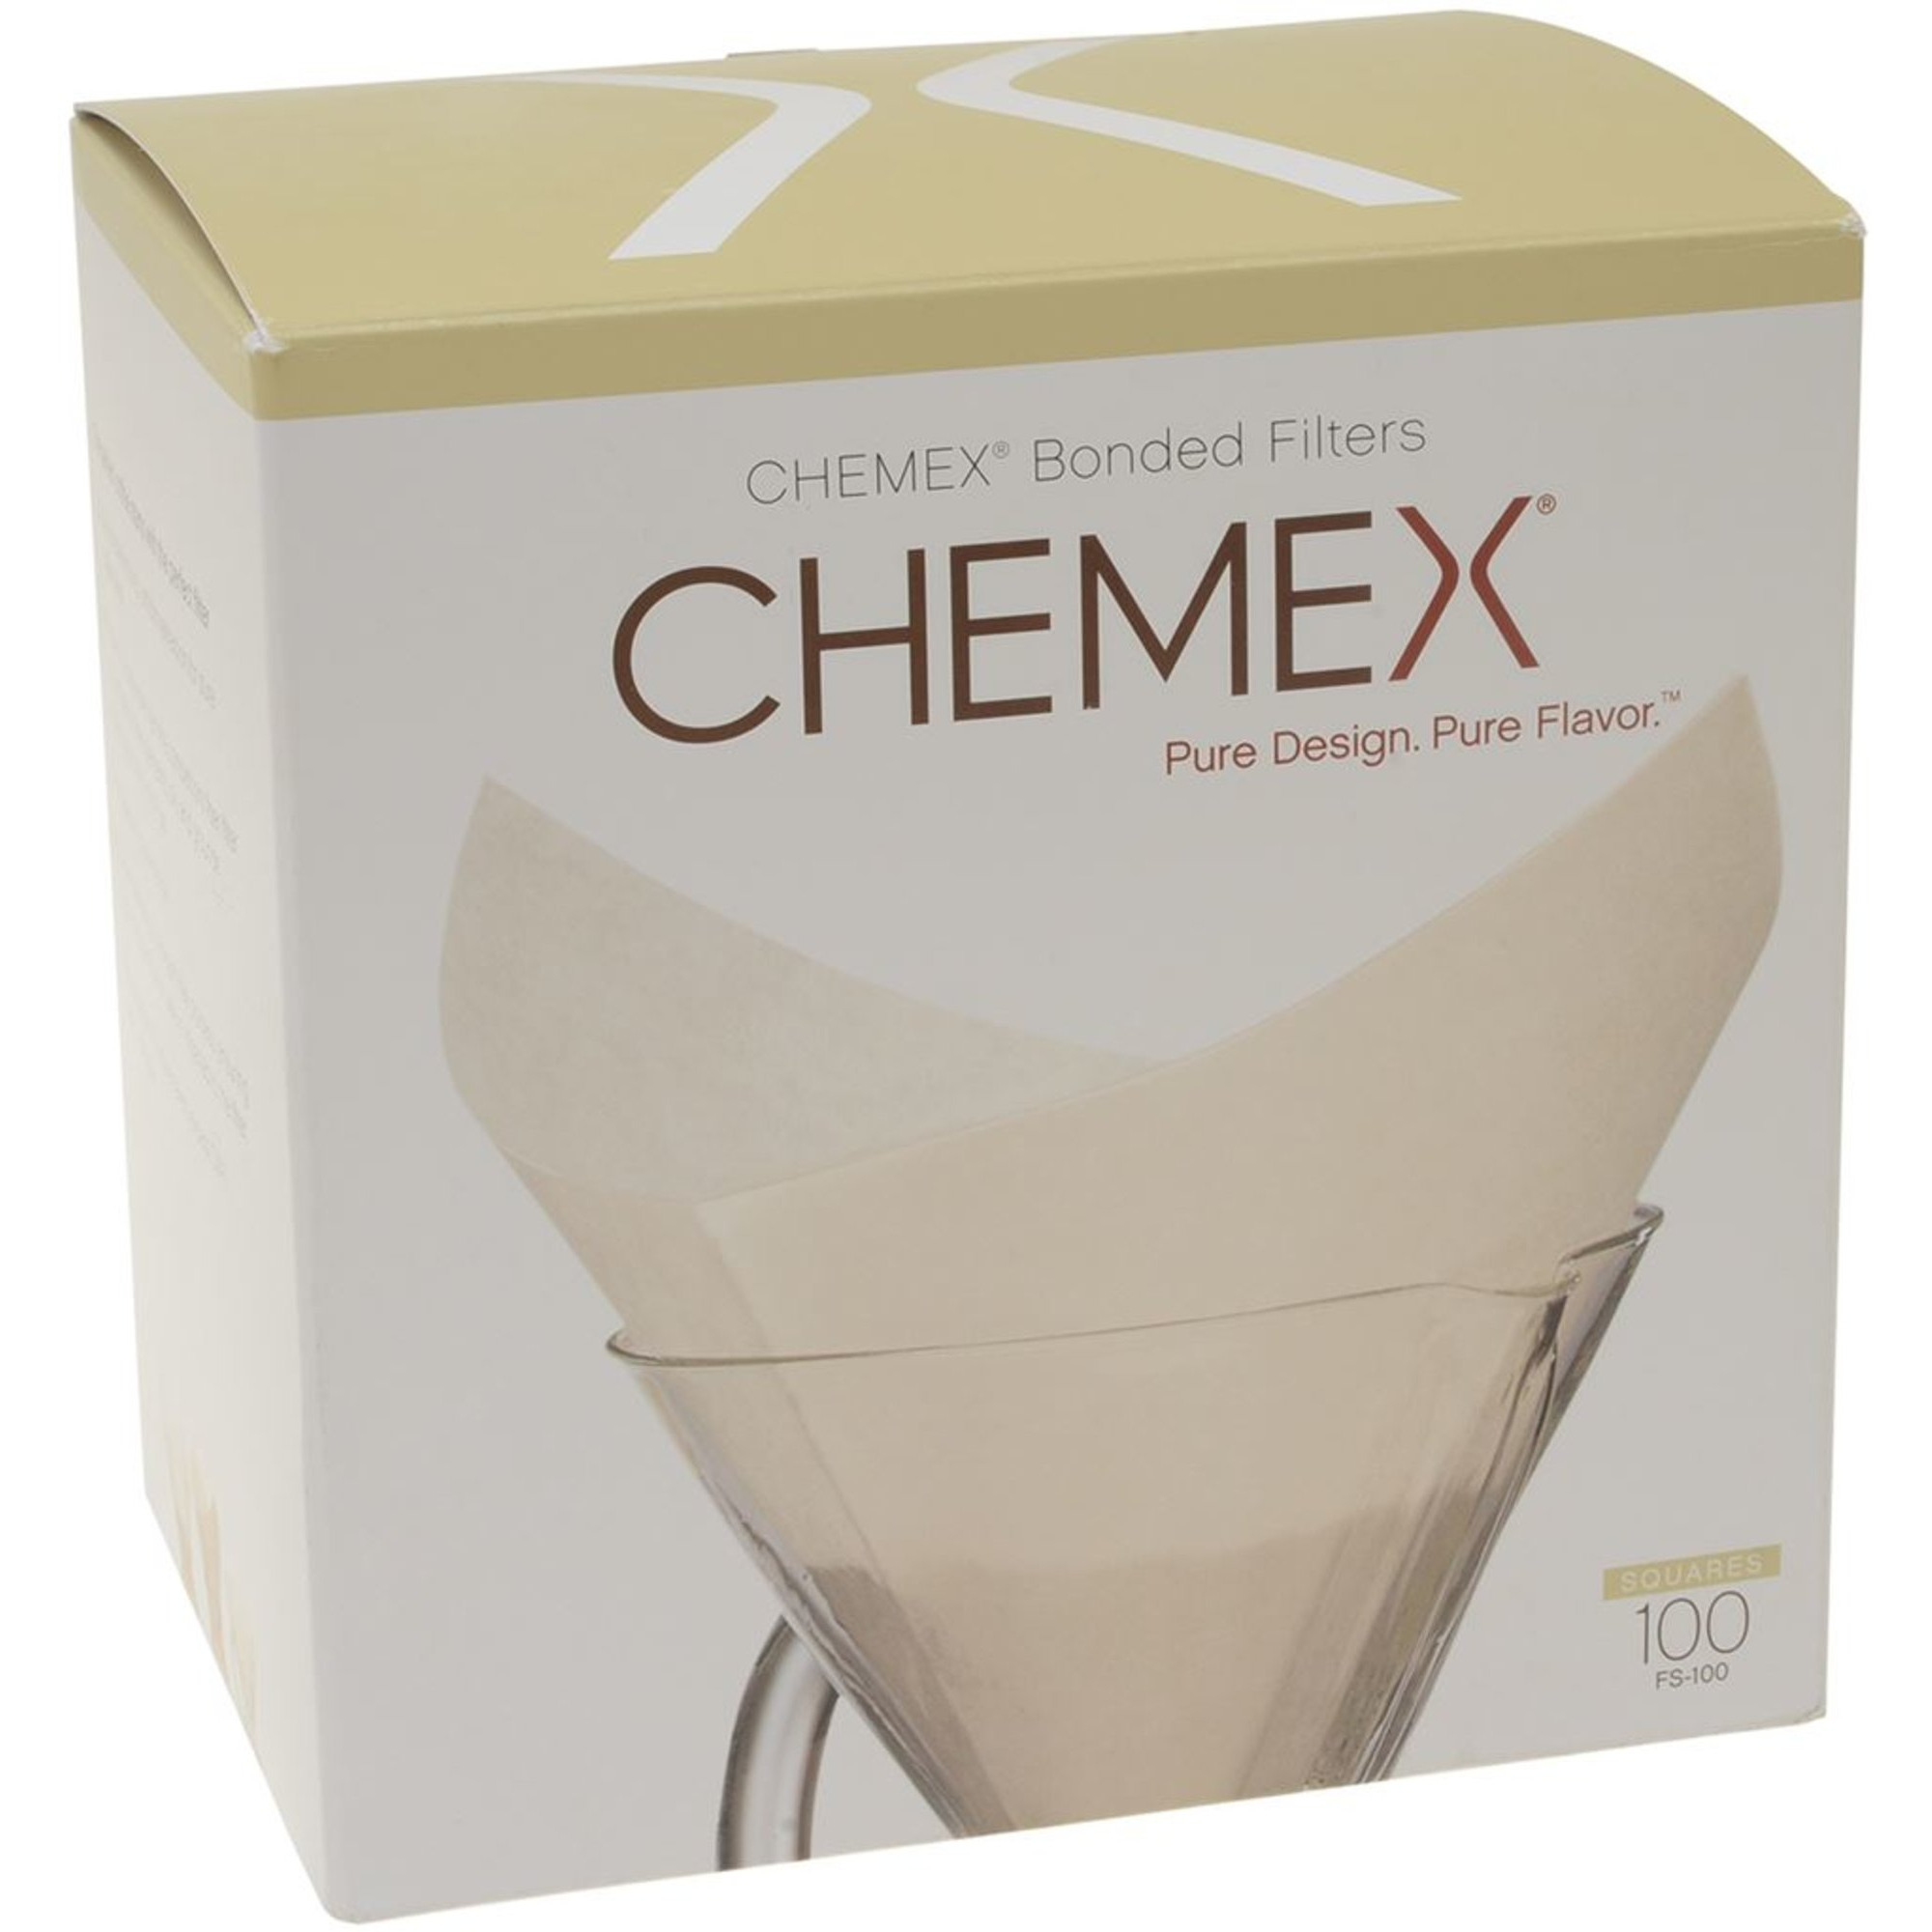 Chemex 100 Kaffefilter